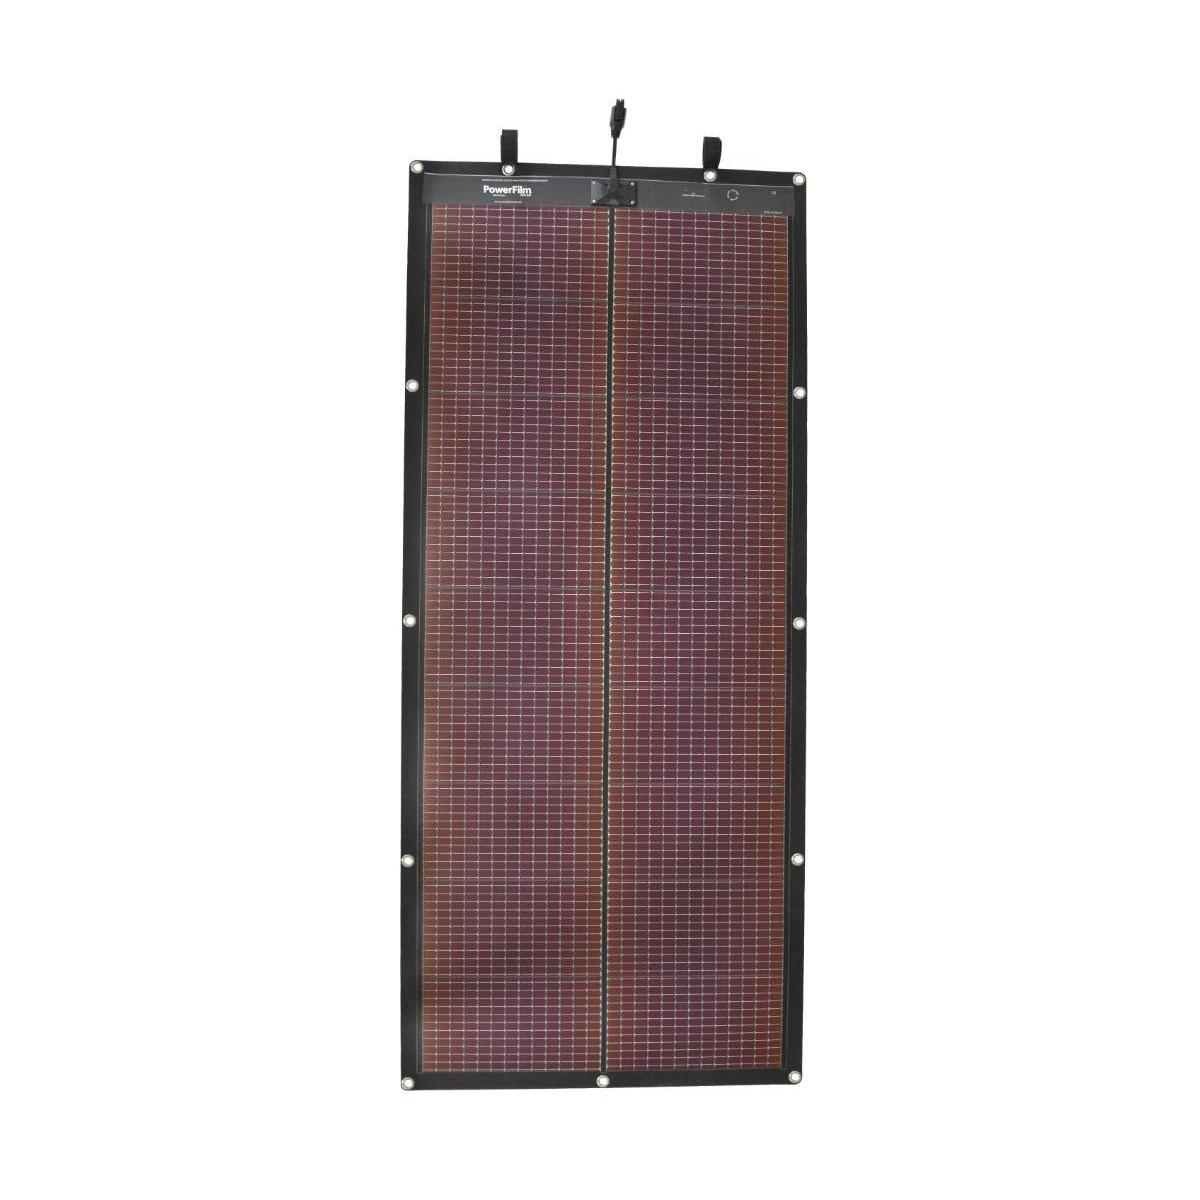 PowerFilm R-42- rollbares Solarmodul 42Wp